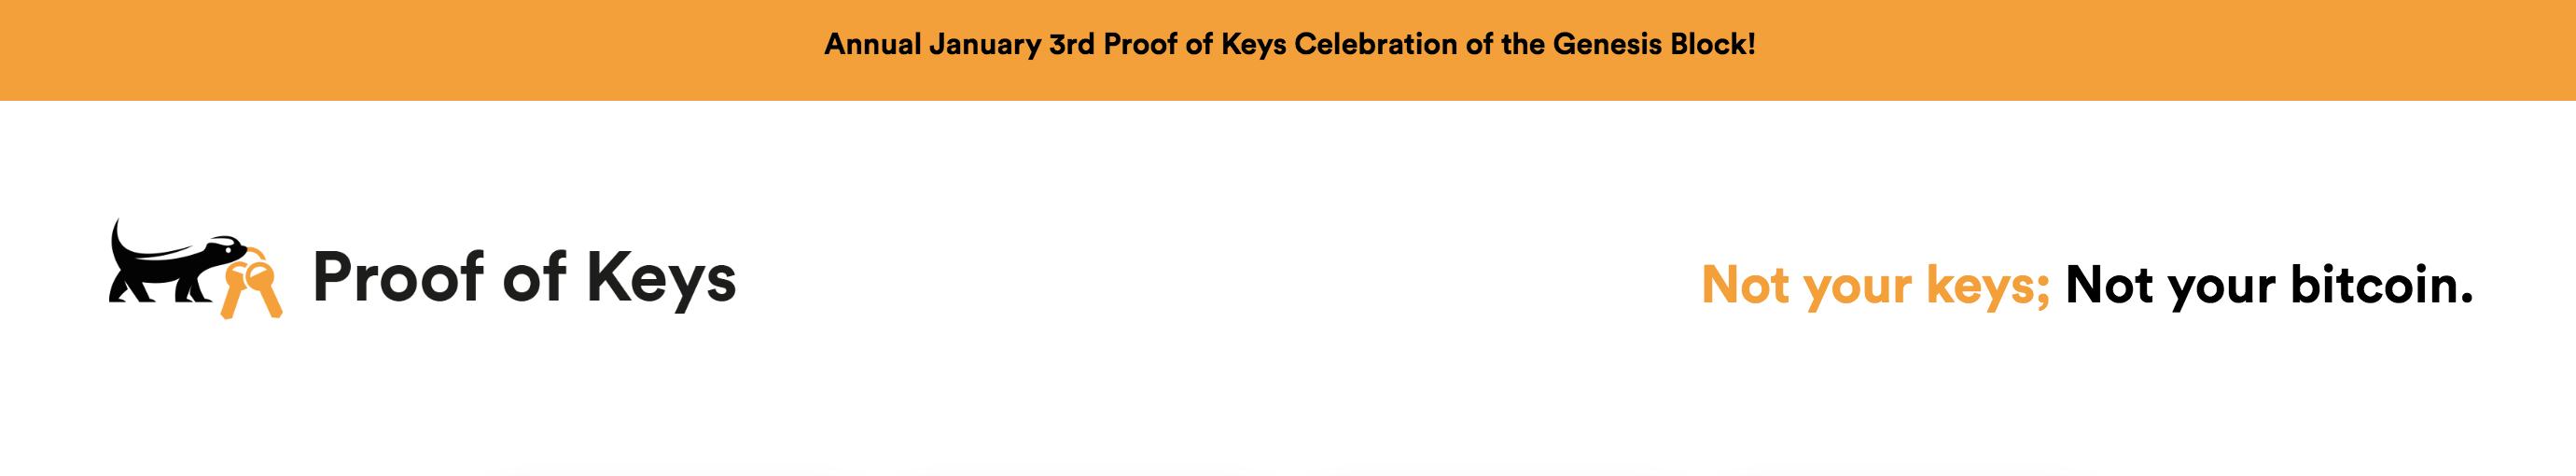 Annual January 3rd Proof of Keys Celebration of the Genesis Block!